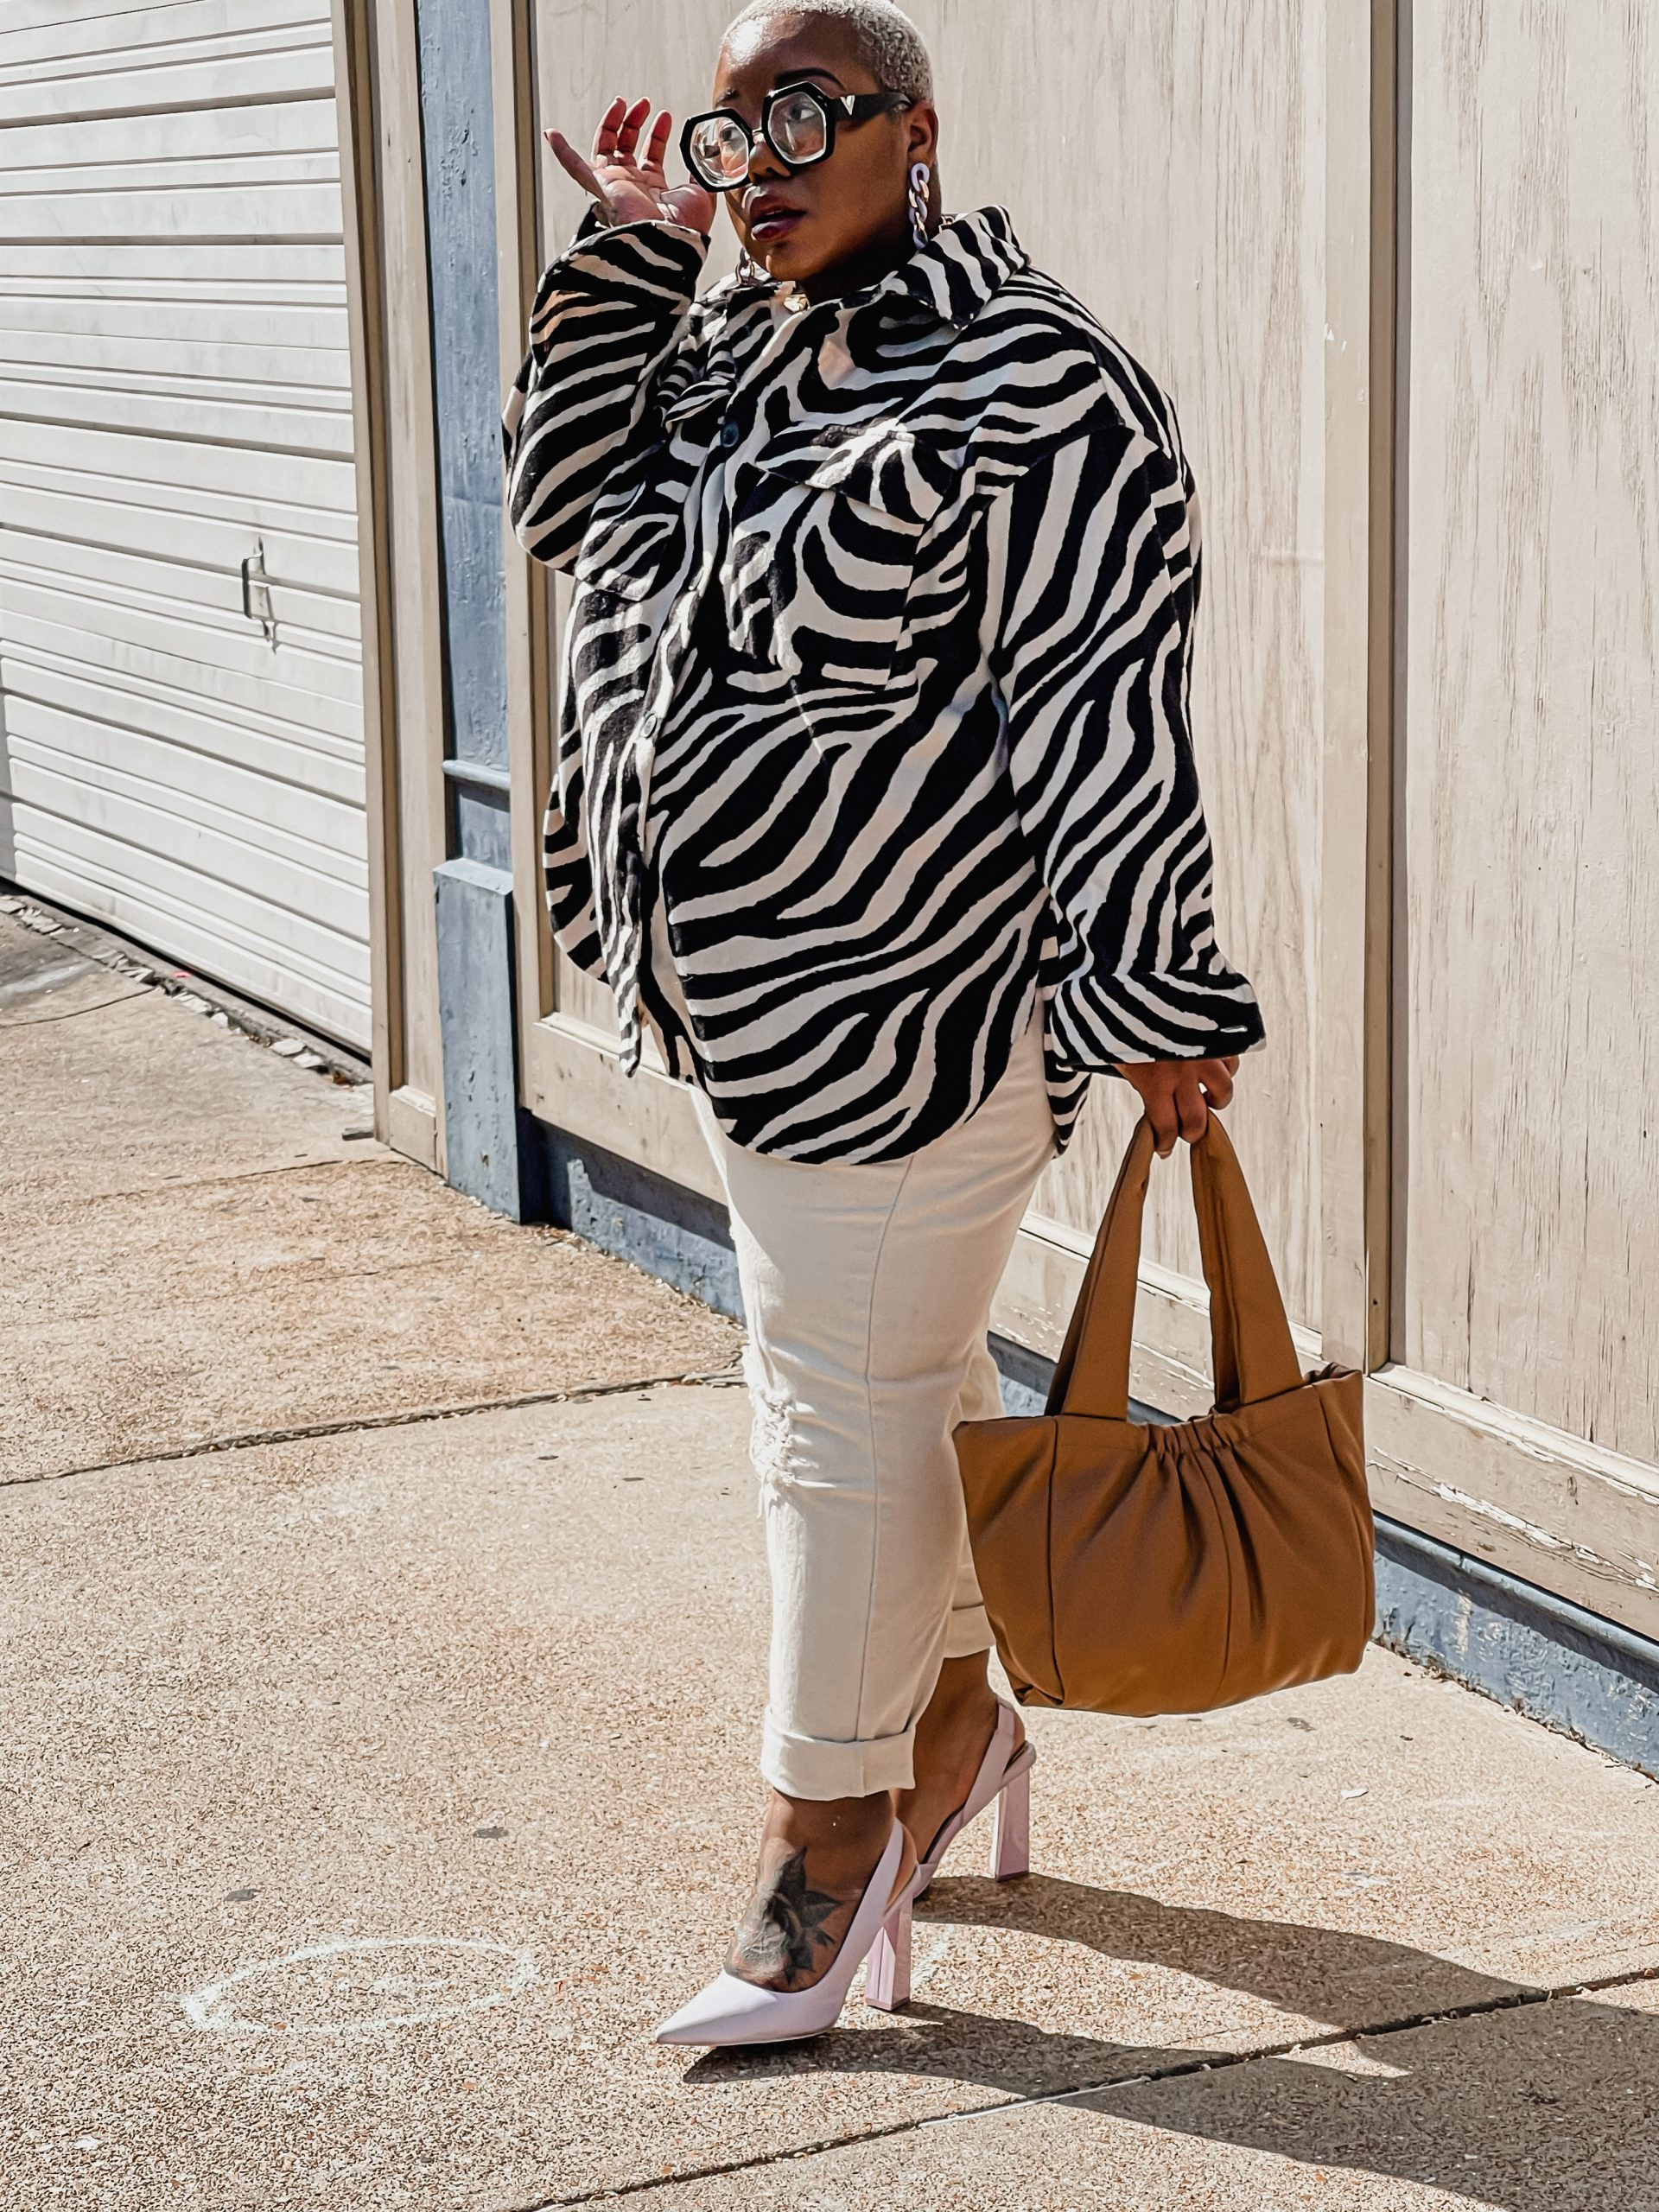 AK Brown Fashion Blogger Style Blogger Fashion Influencer Style Influencer Fashion Stylist Personal Stylist zebra shacket H&M Black fashion blogger